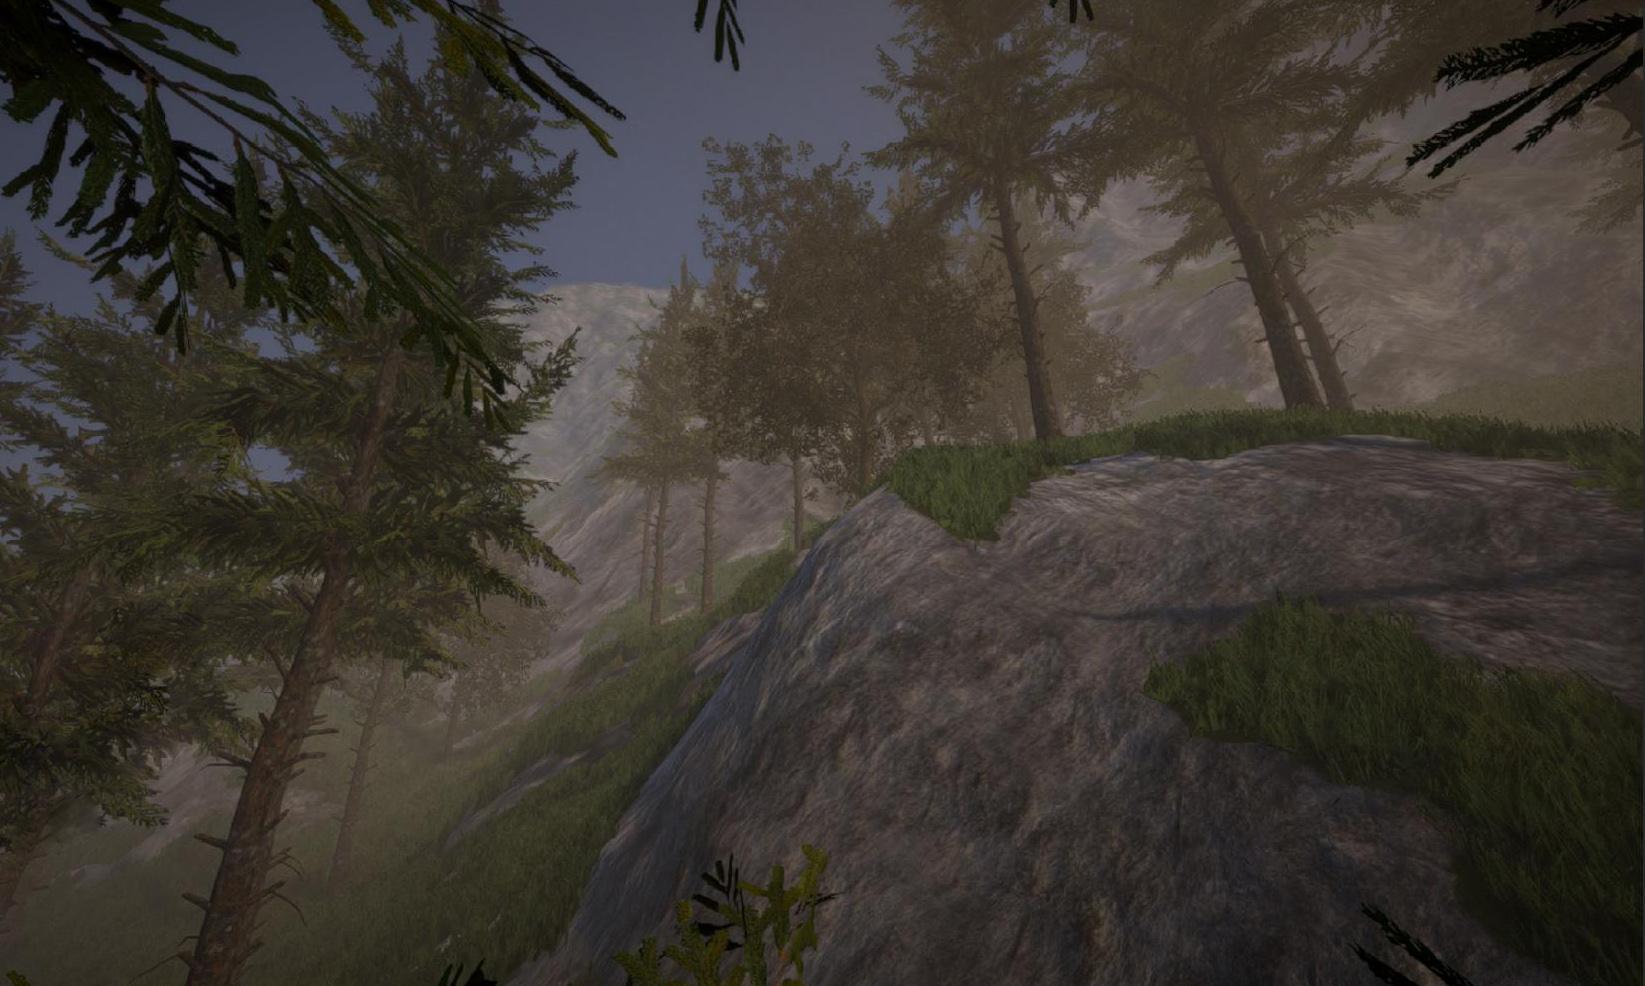 terrain1.jpg